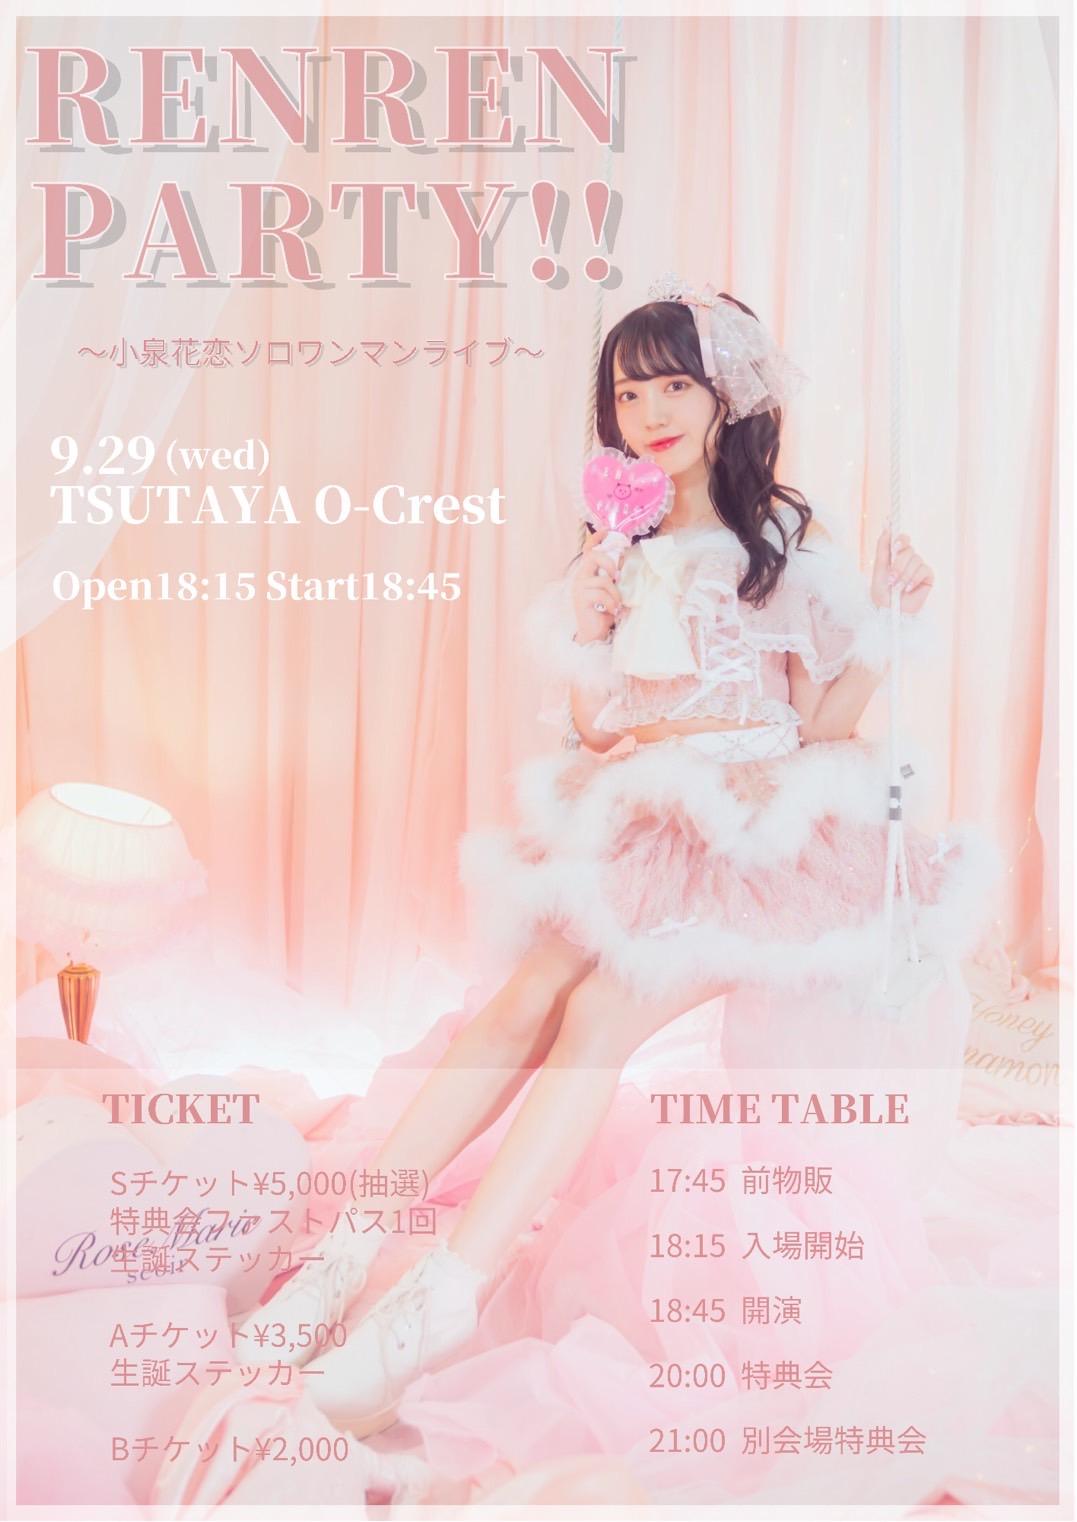 RENREN PARTY!!〜小泉花恋ソロワンマンライブ〜